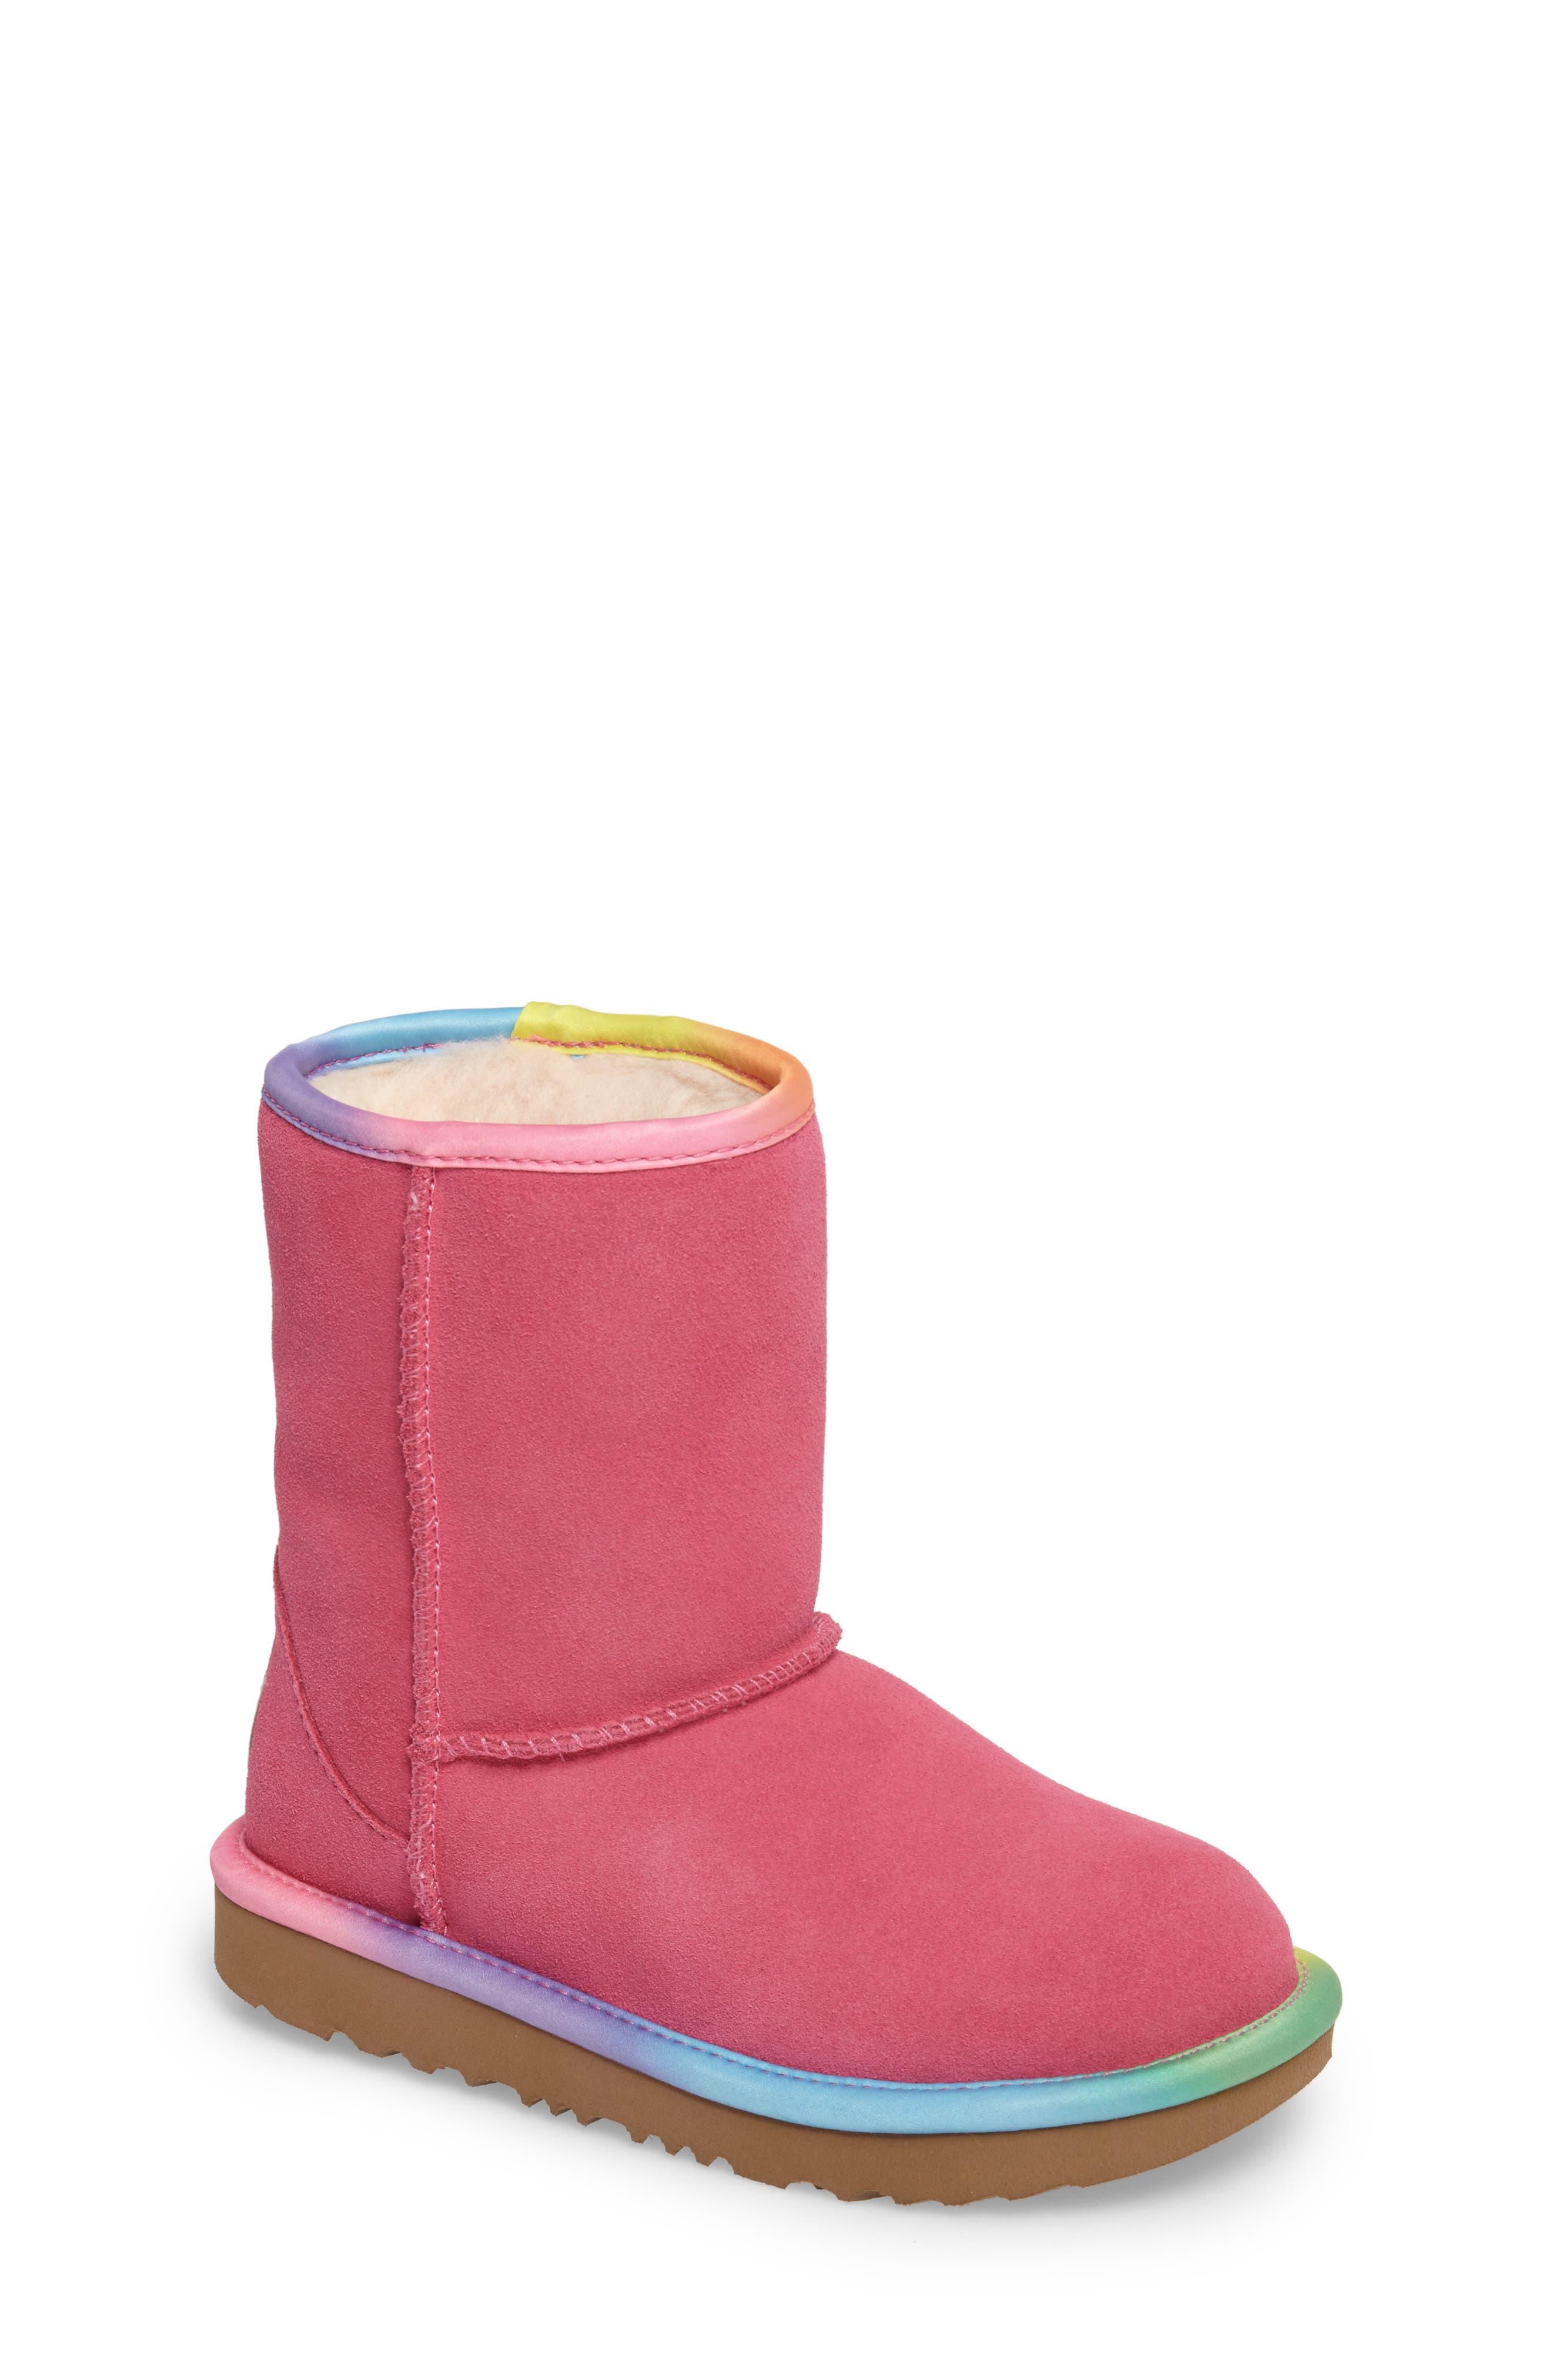 UGG® Classic Short II Water-Resistant Genuine Shearling Rainbow Boot (Walker, Toddler, Little Kid & Big Kid)